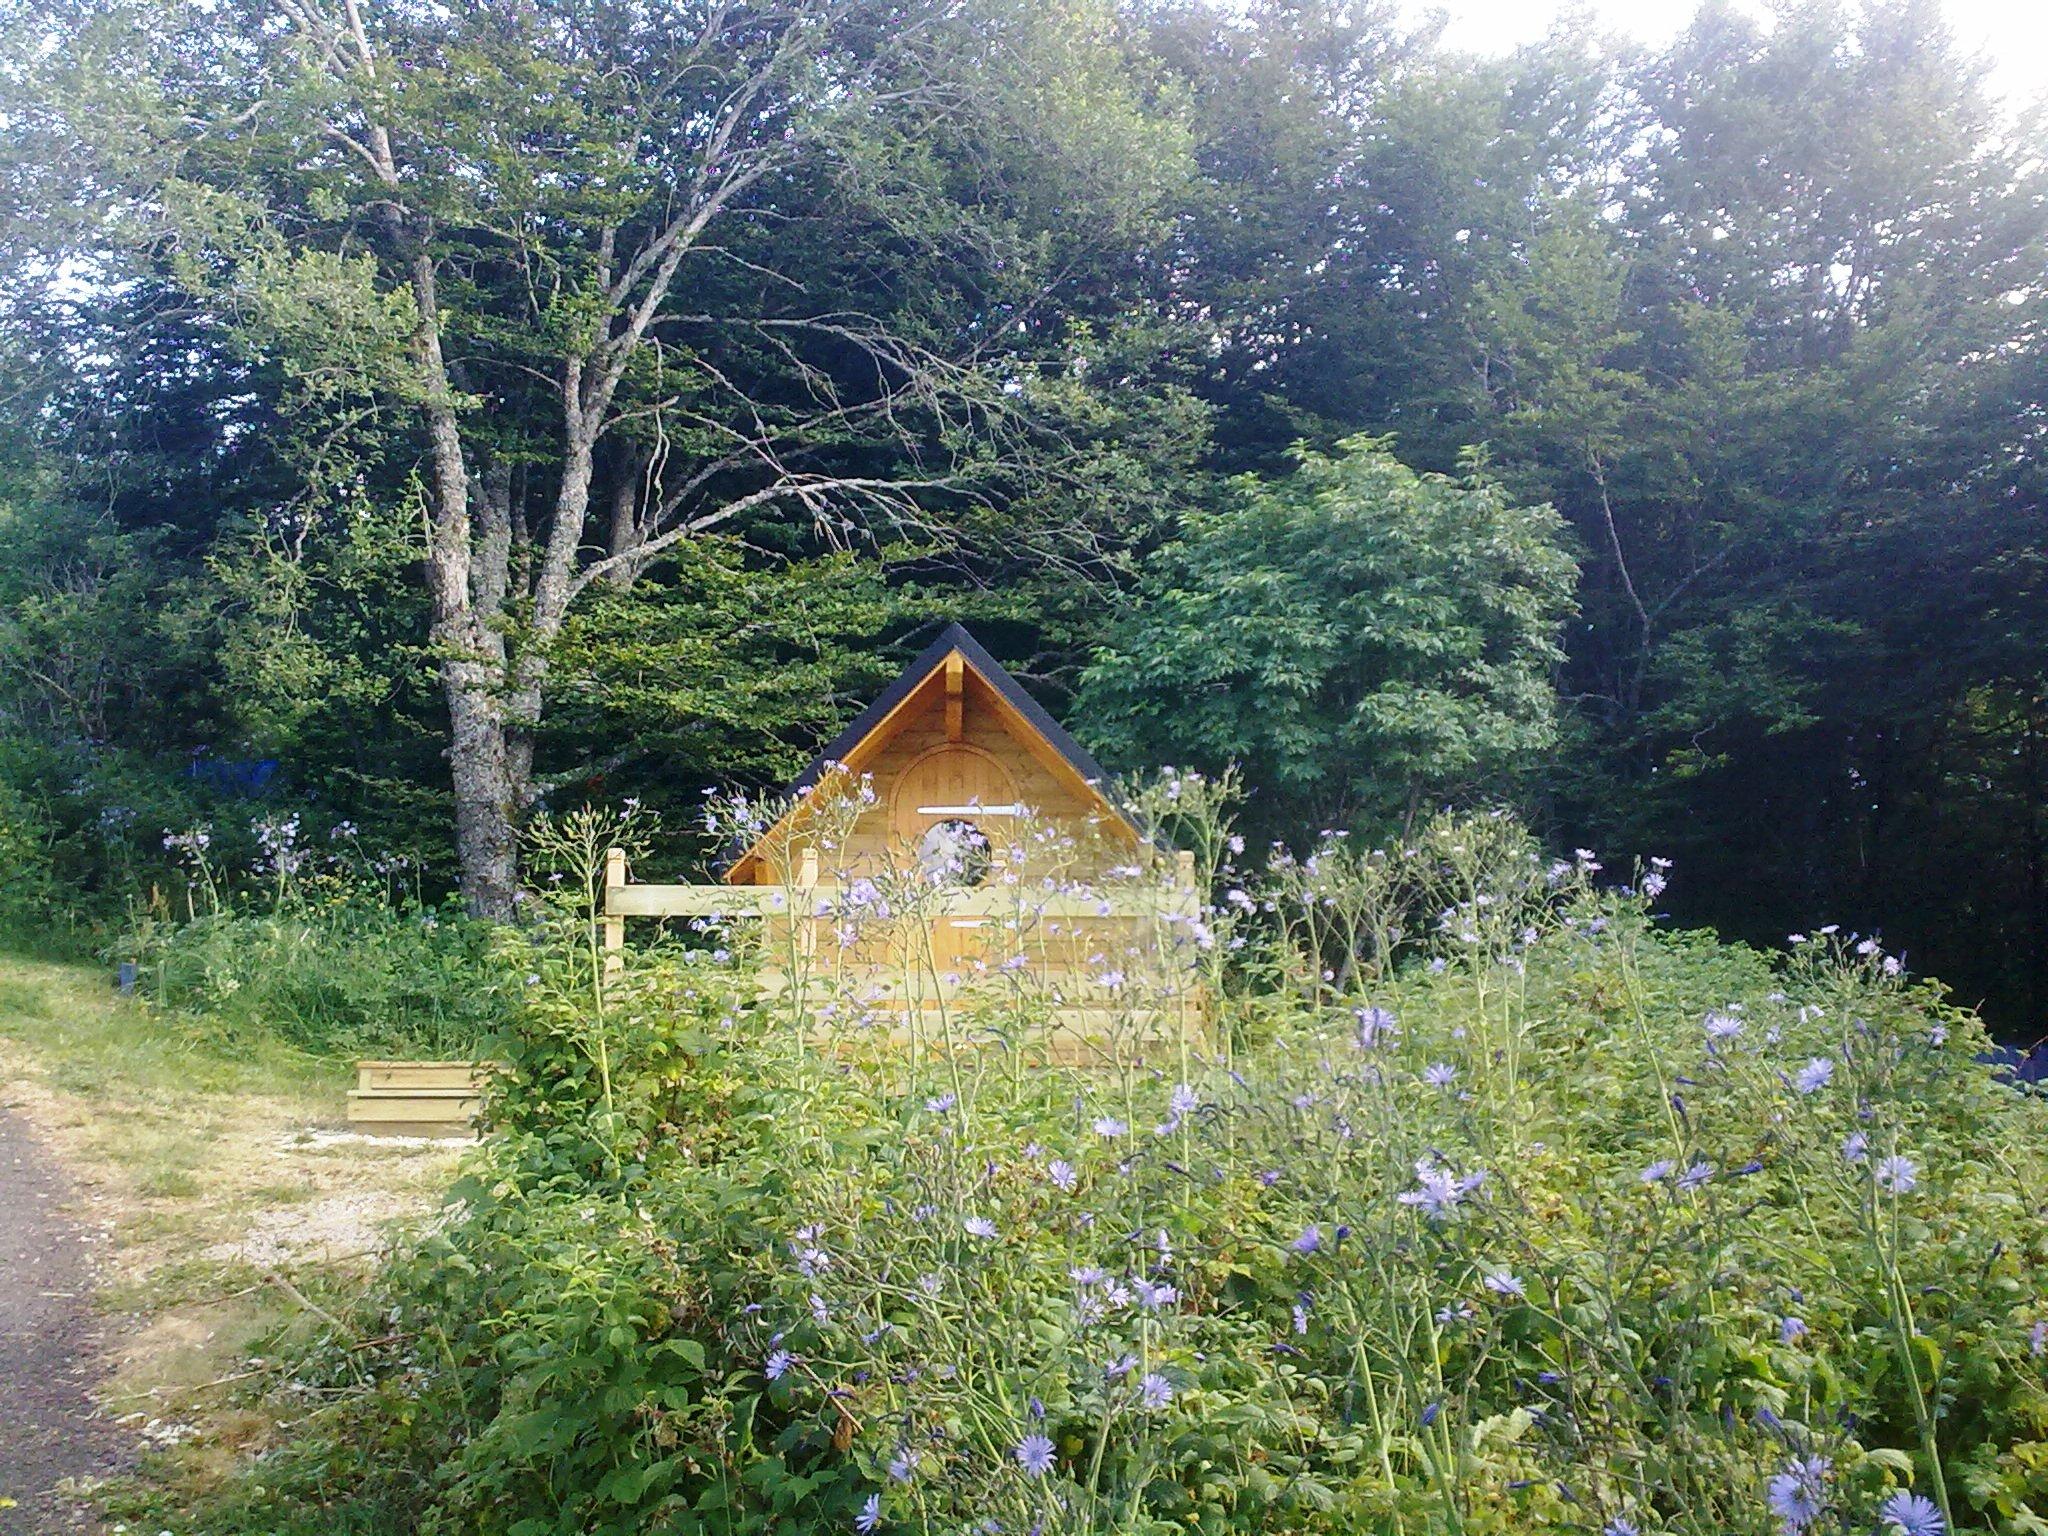 auvergne-camping mont dore-cabane 1